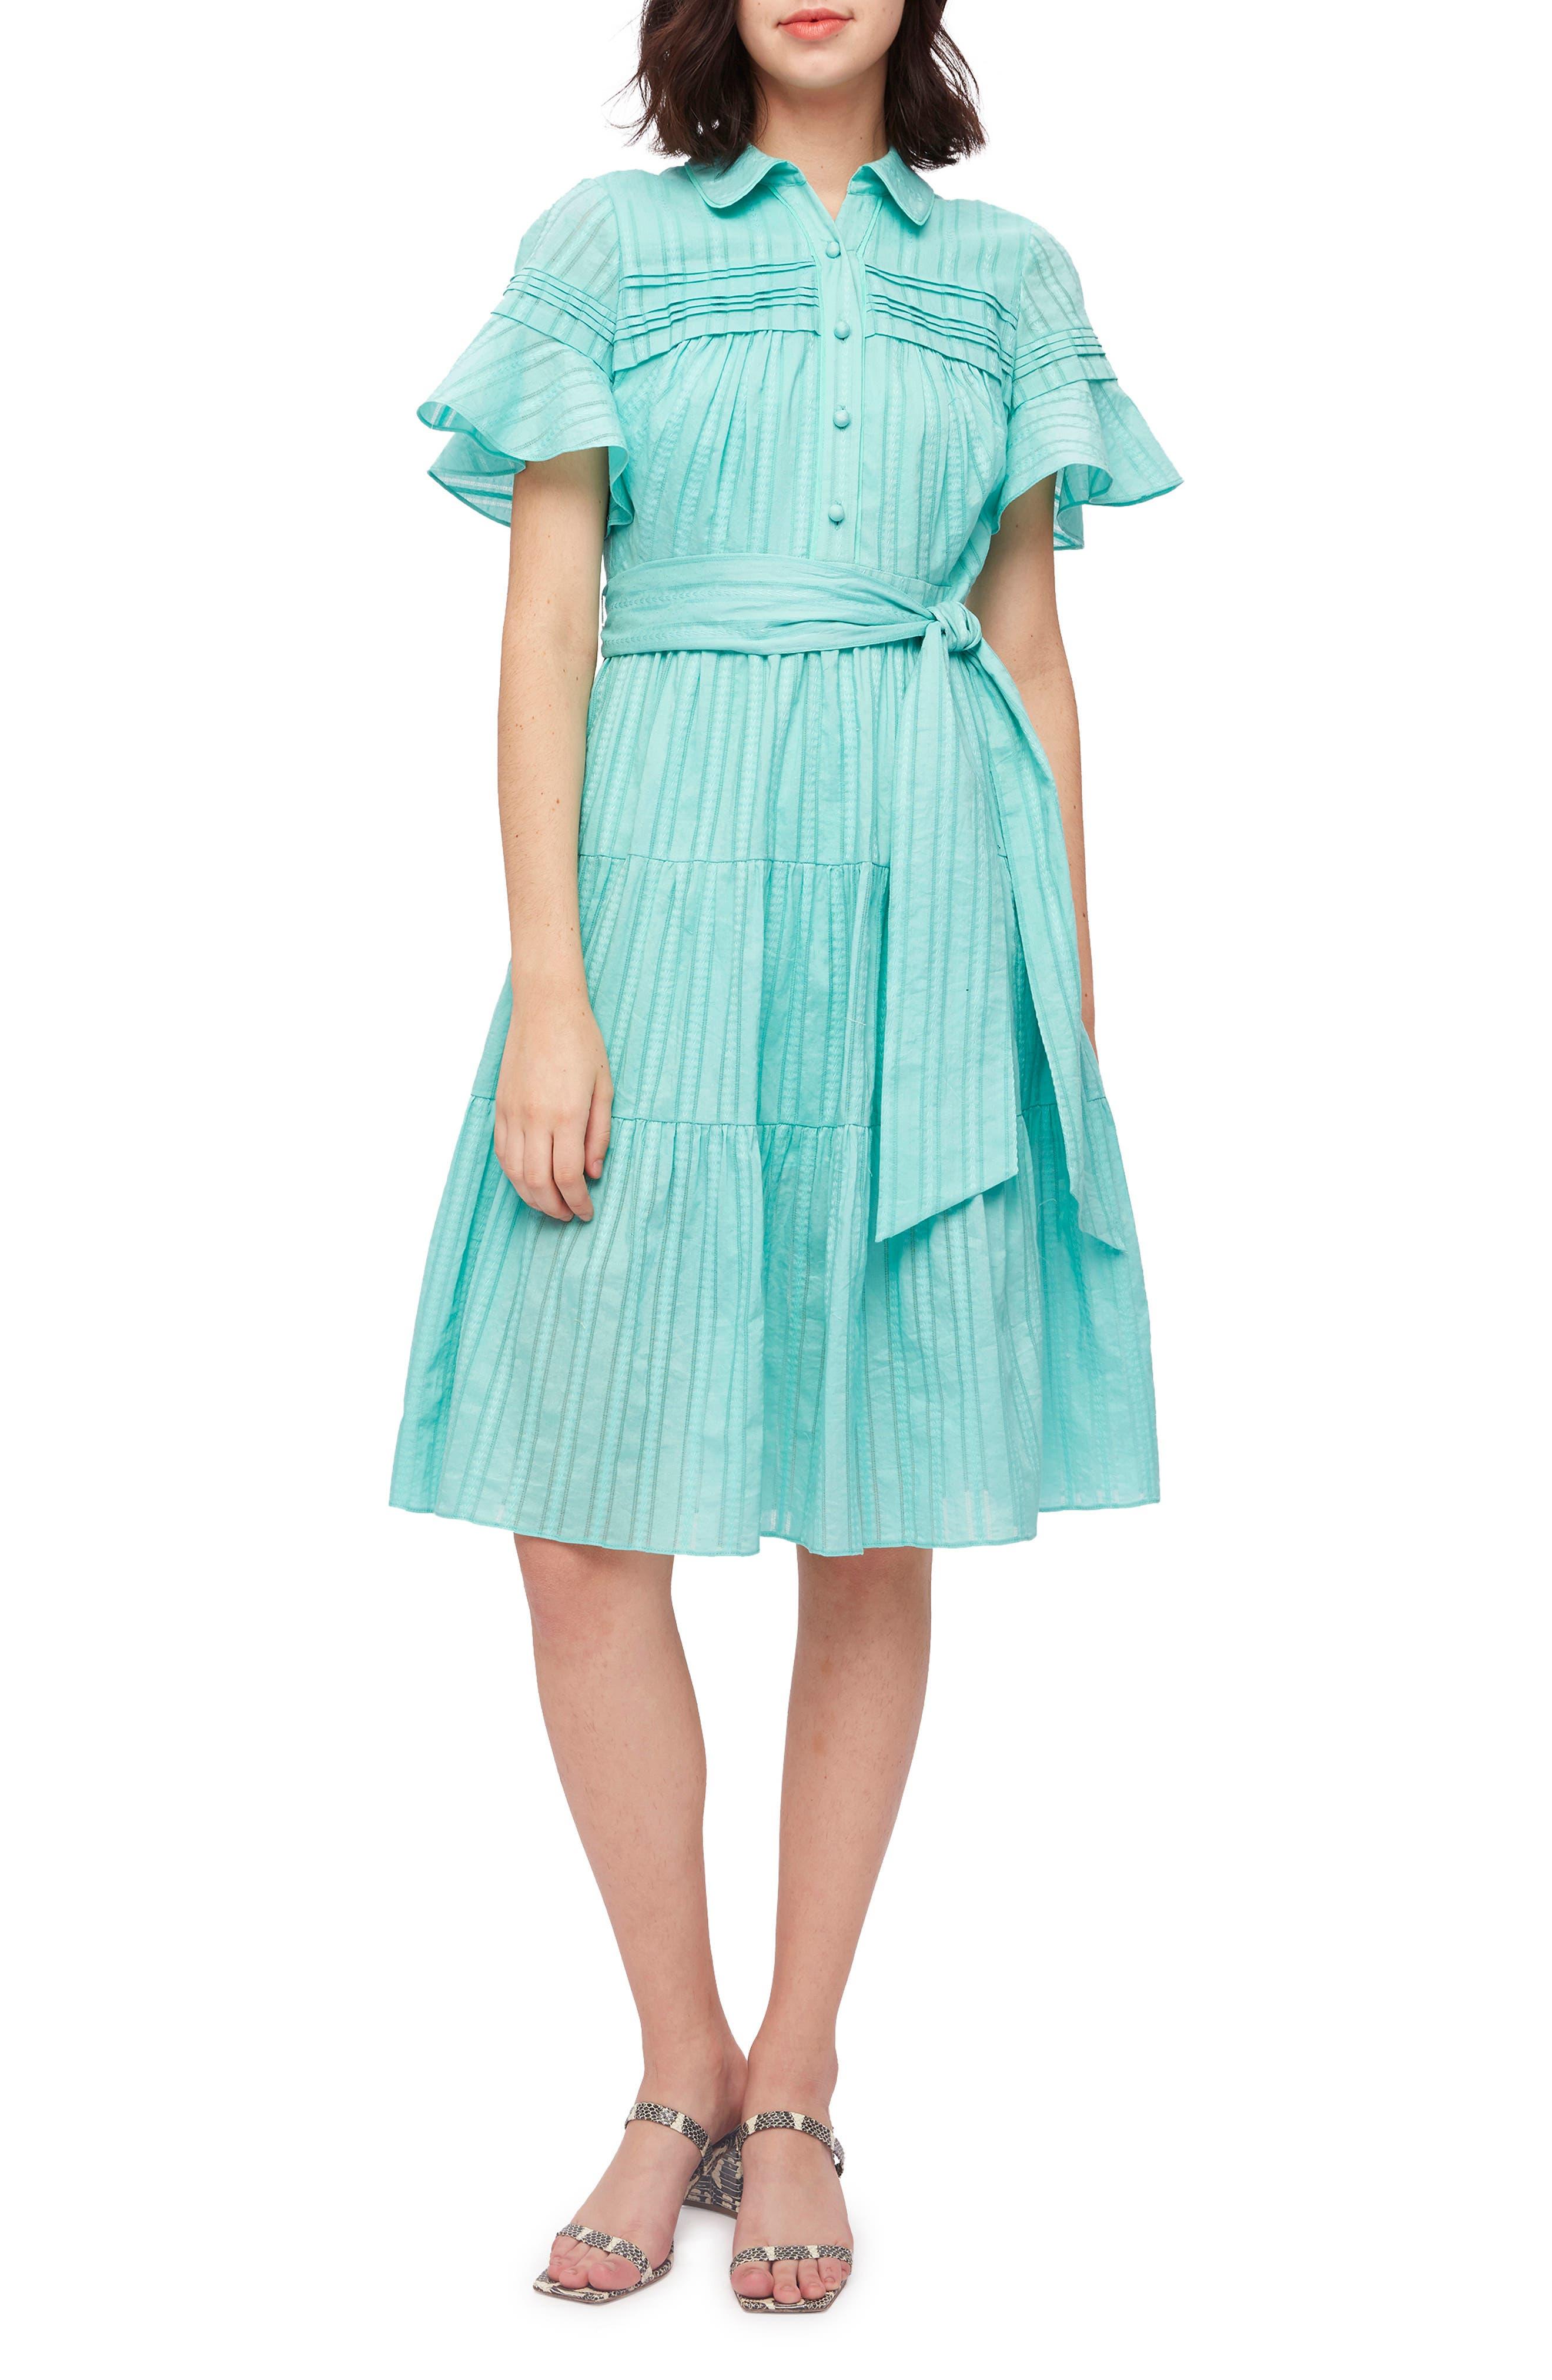 Rachel Tie Waist Dress